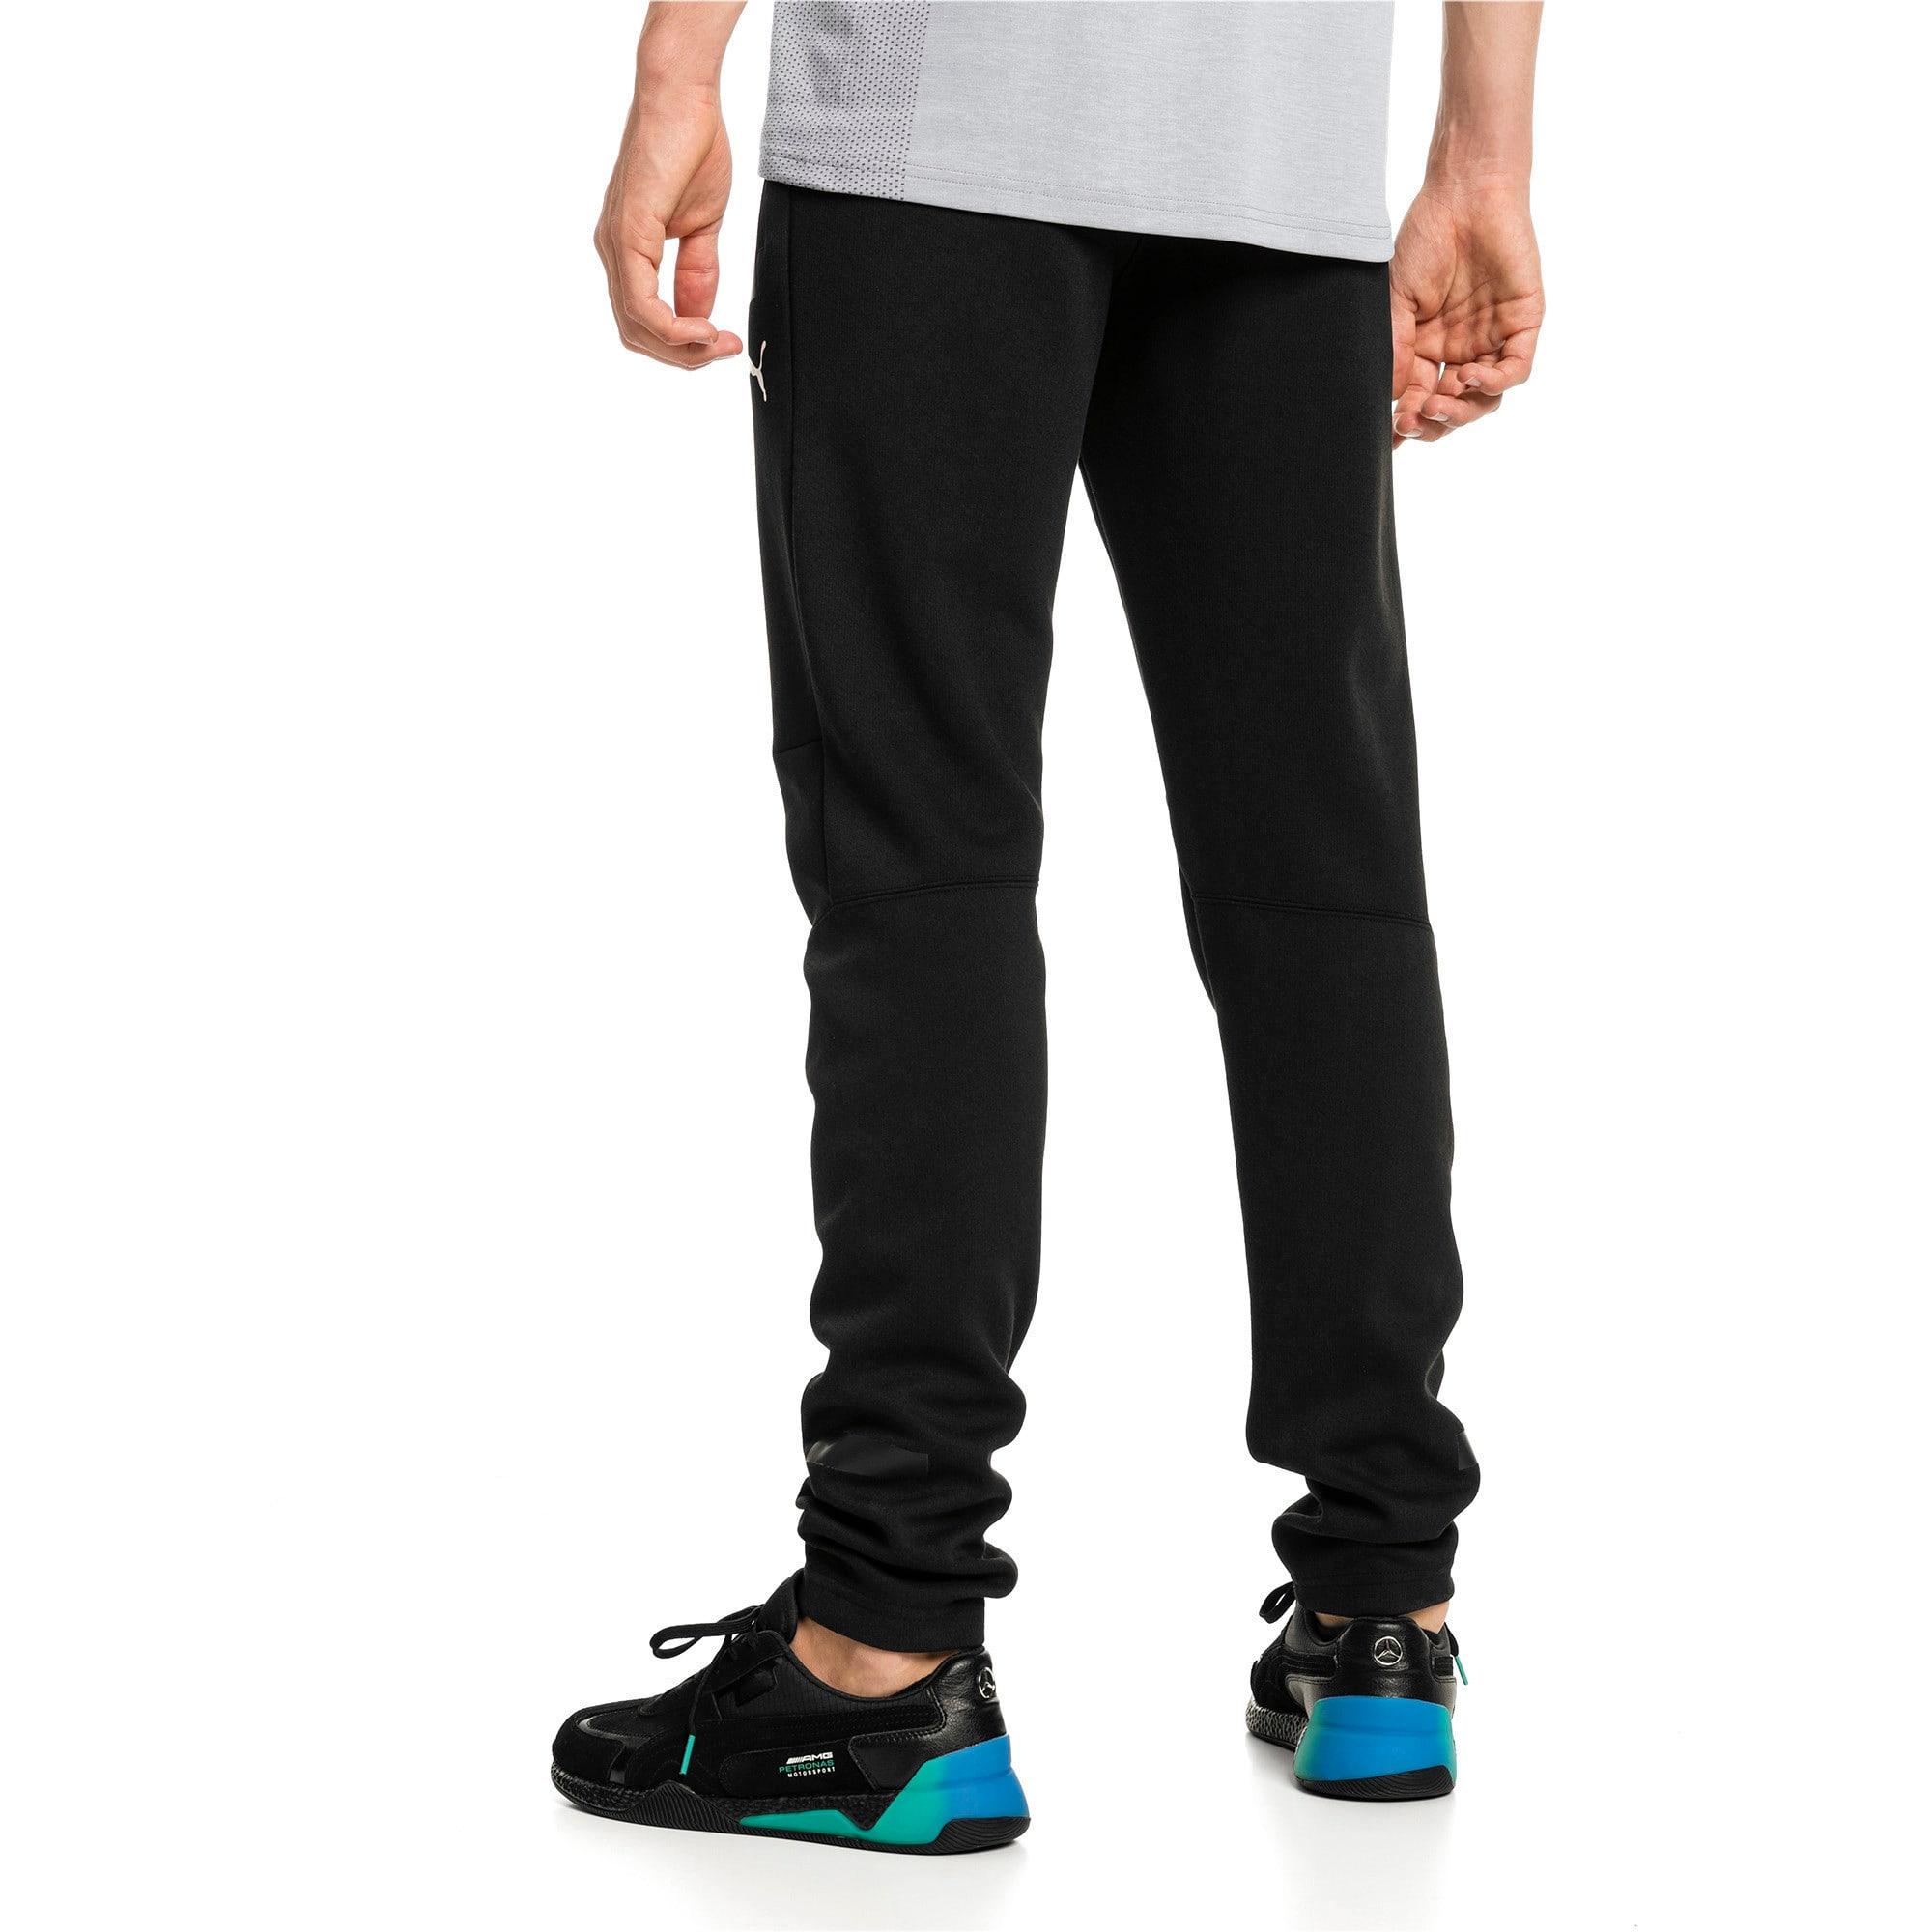 Thumbnail 2 of Mercedes AMG Petronas Knitted Men's Sweatpants, Puma Black, medium-IND